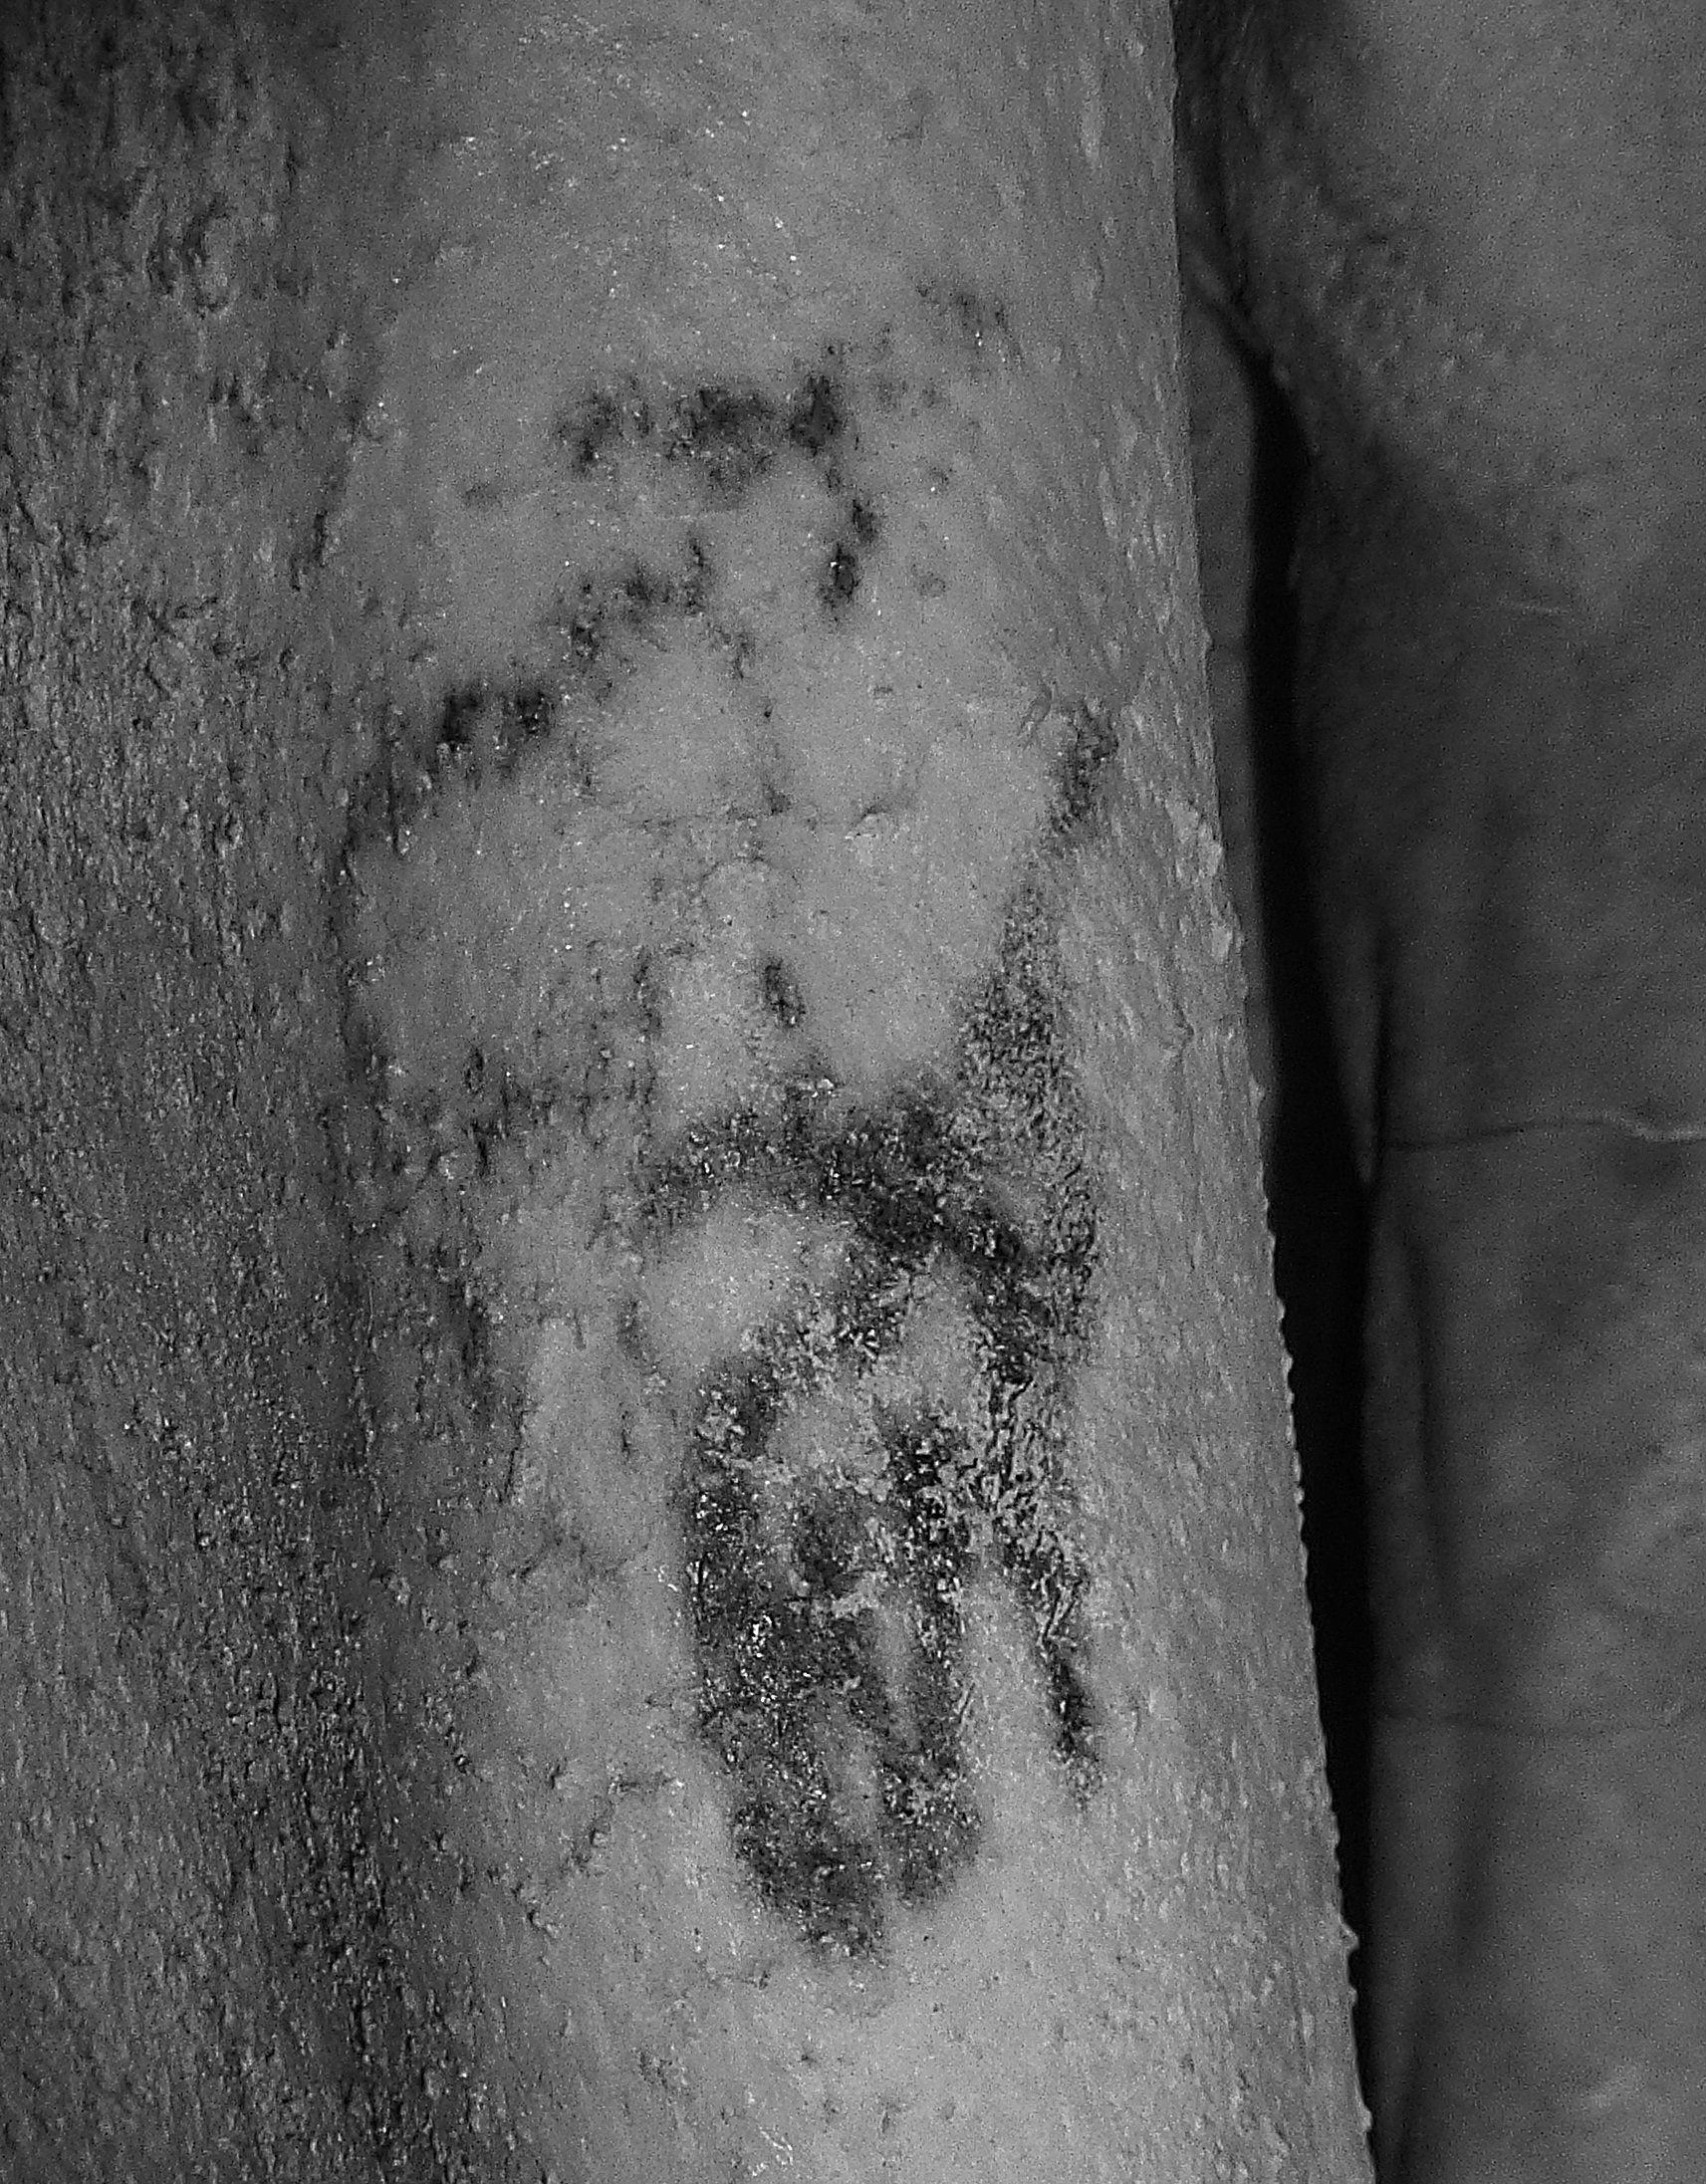 3_1_Gebelein Man tattoo